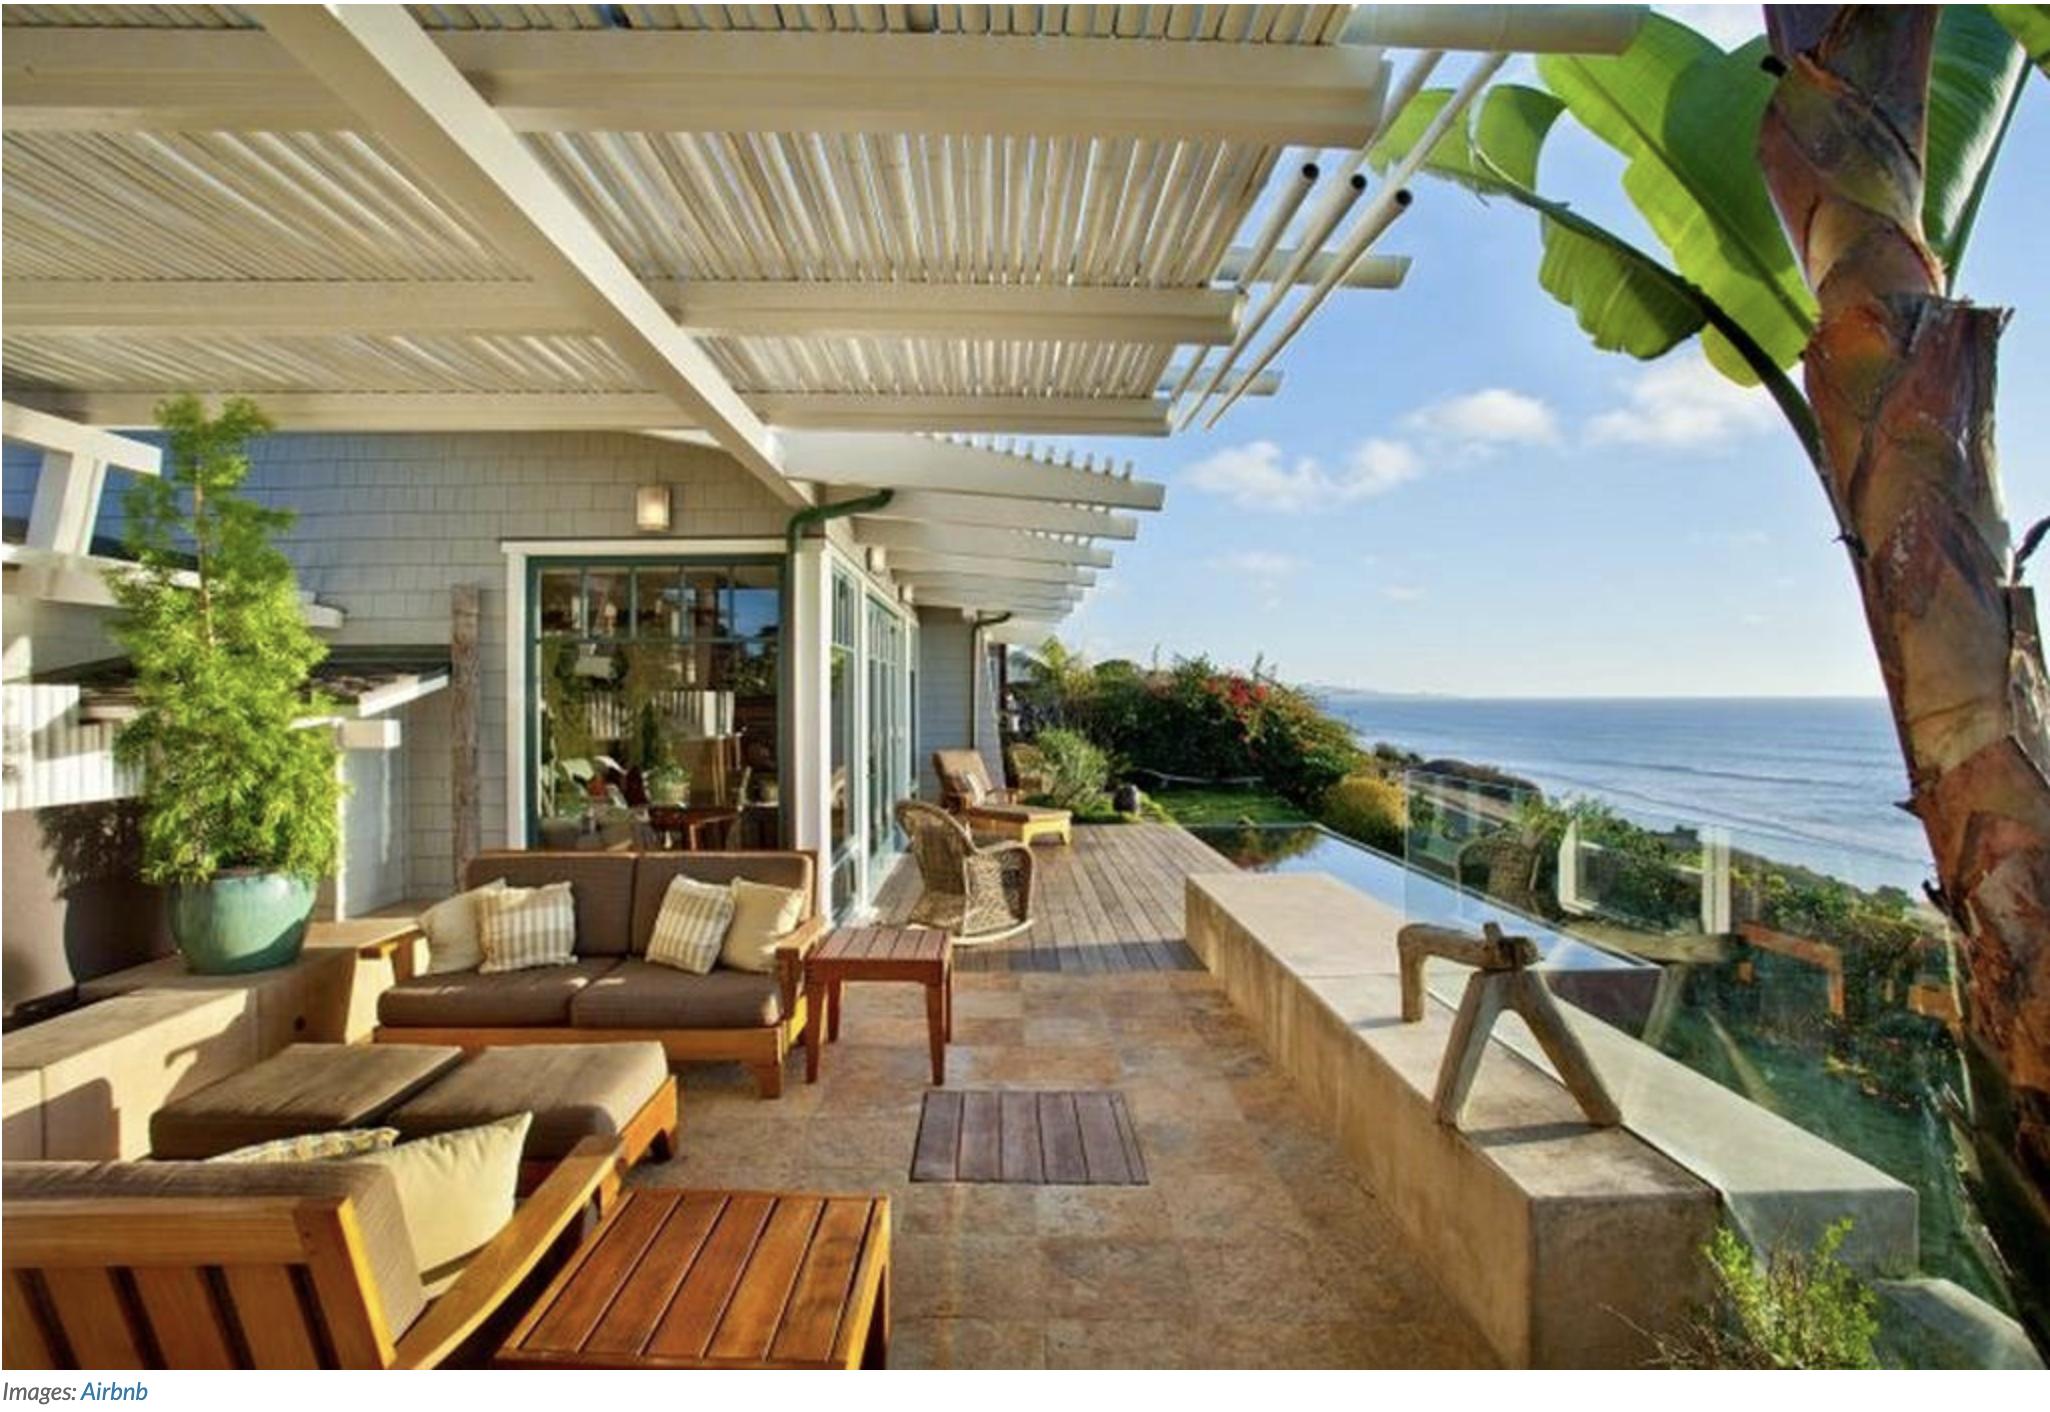 Luxury Airbnb San Diego